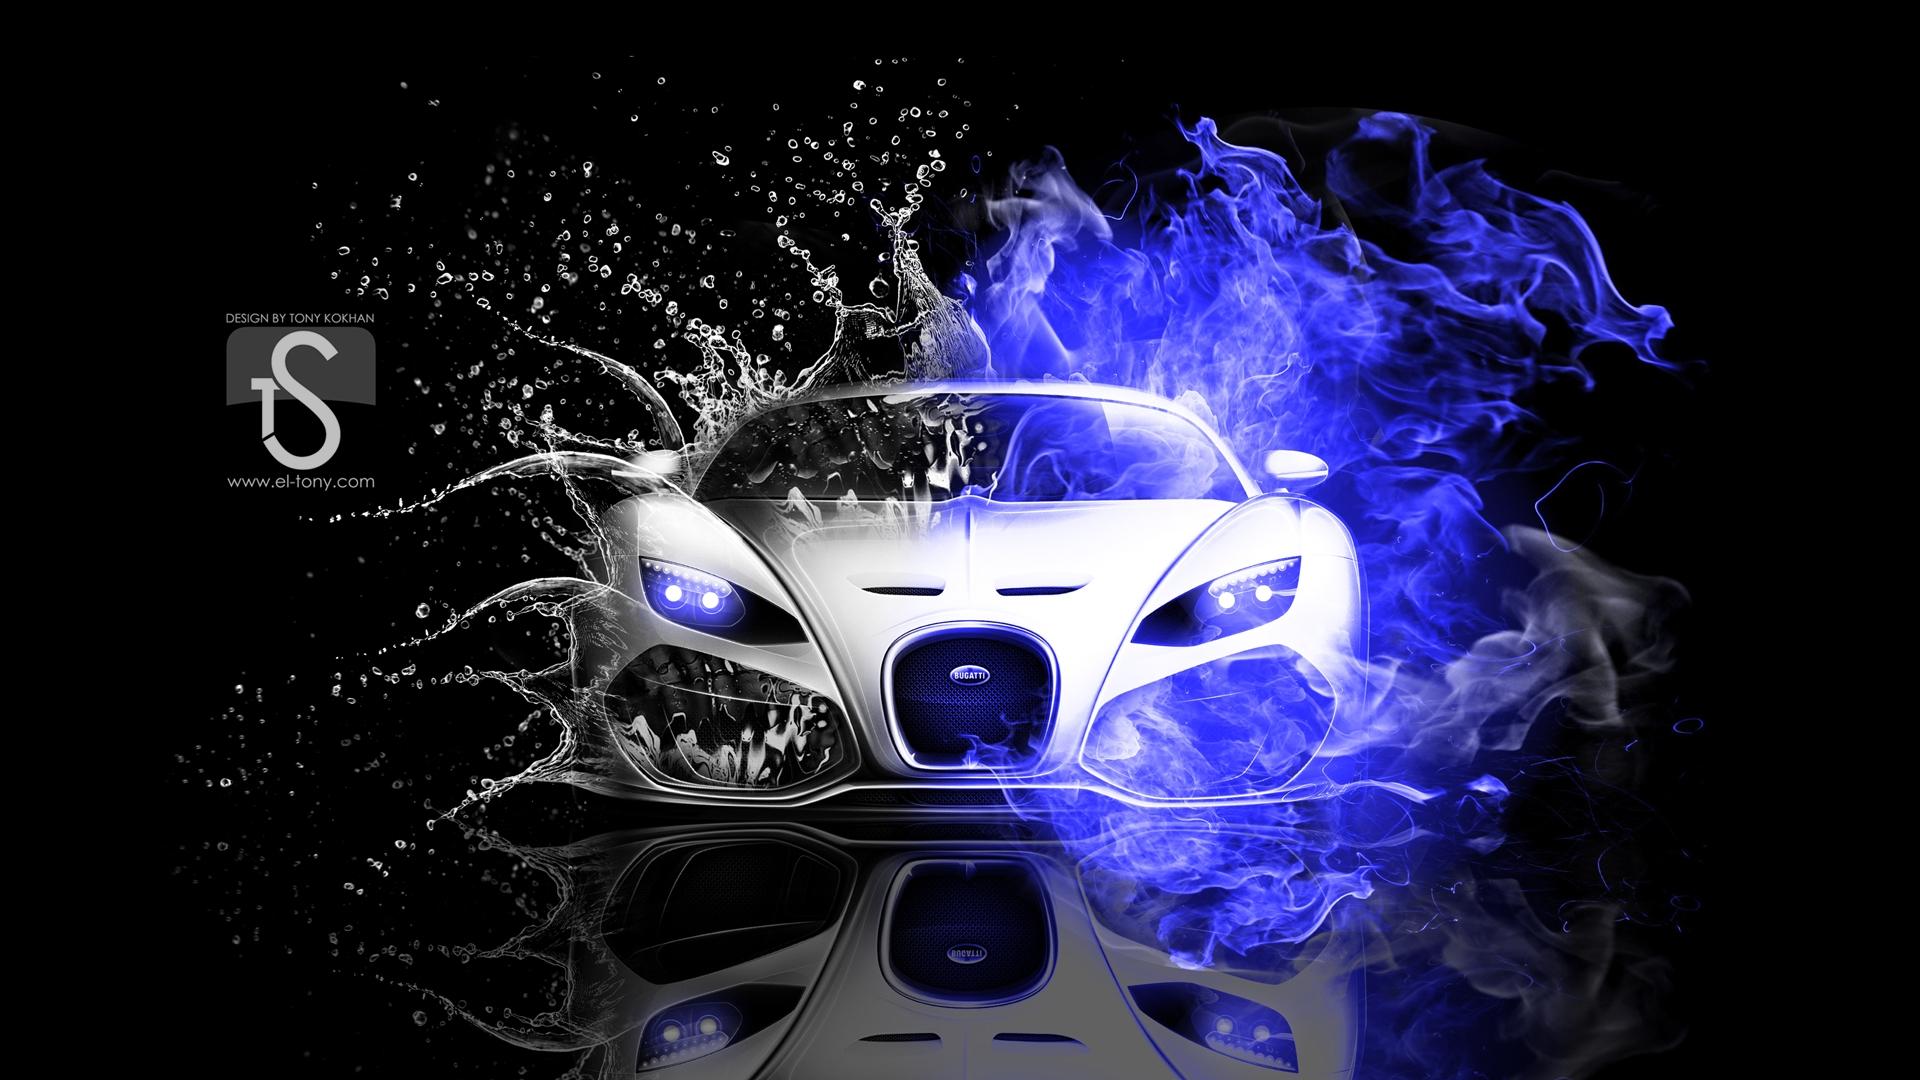 cool car wallpaper hd 1080p